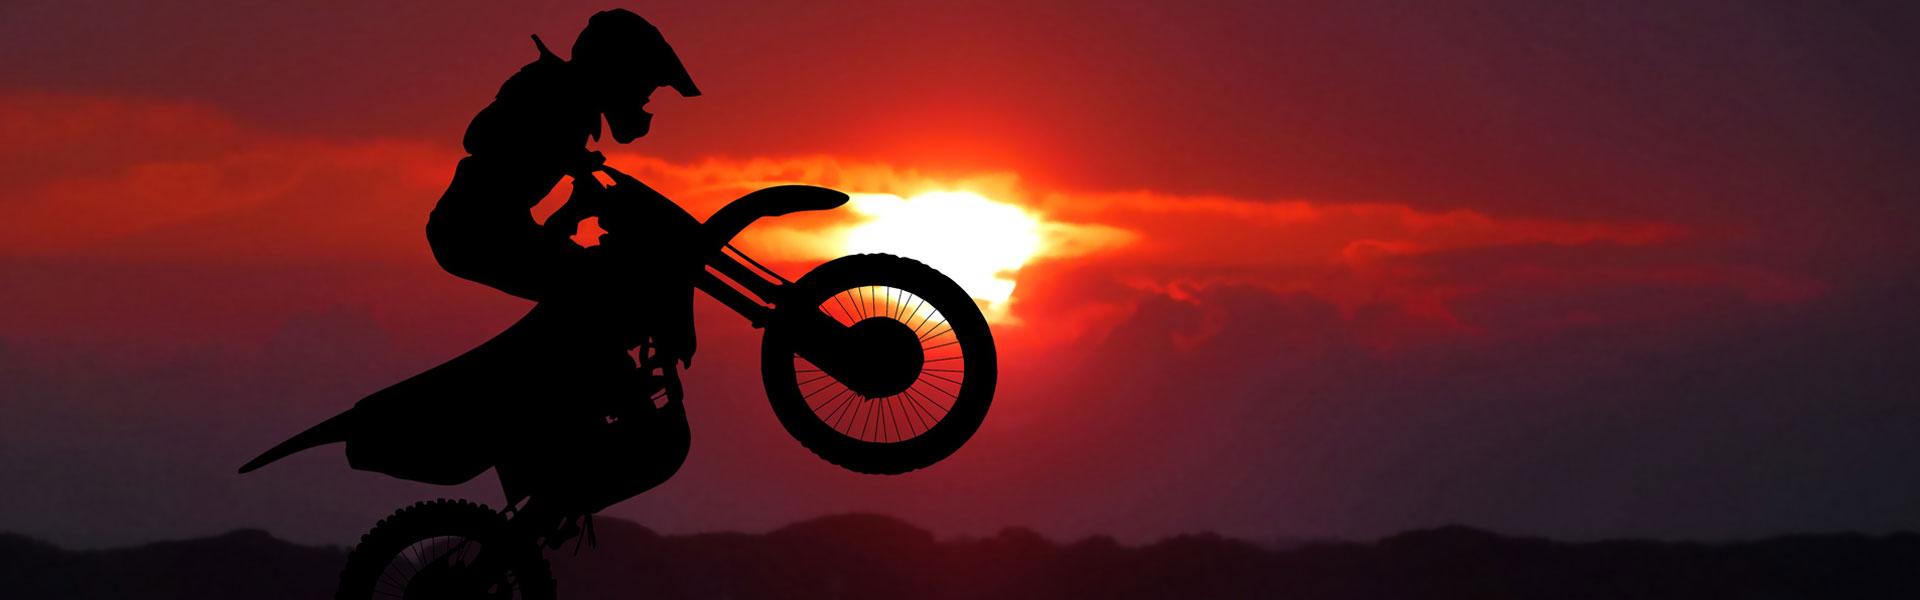 annulation épreuves moto